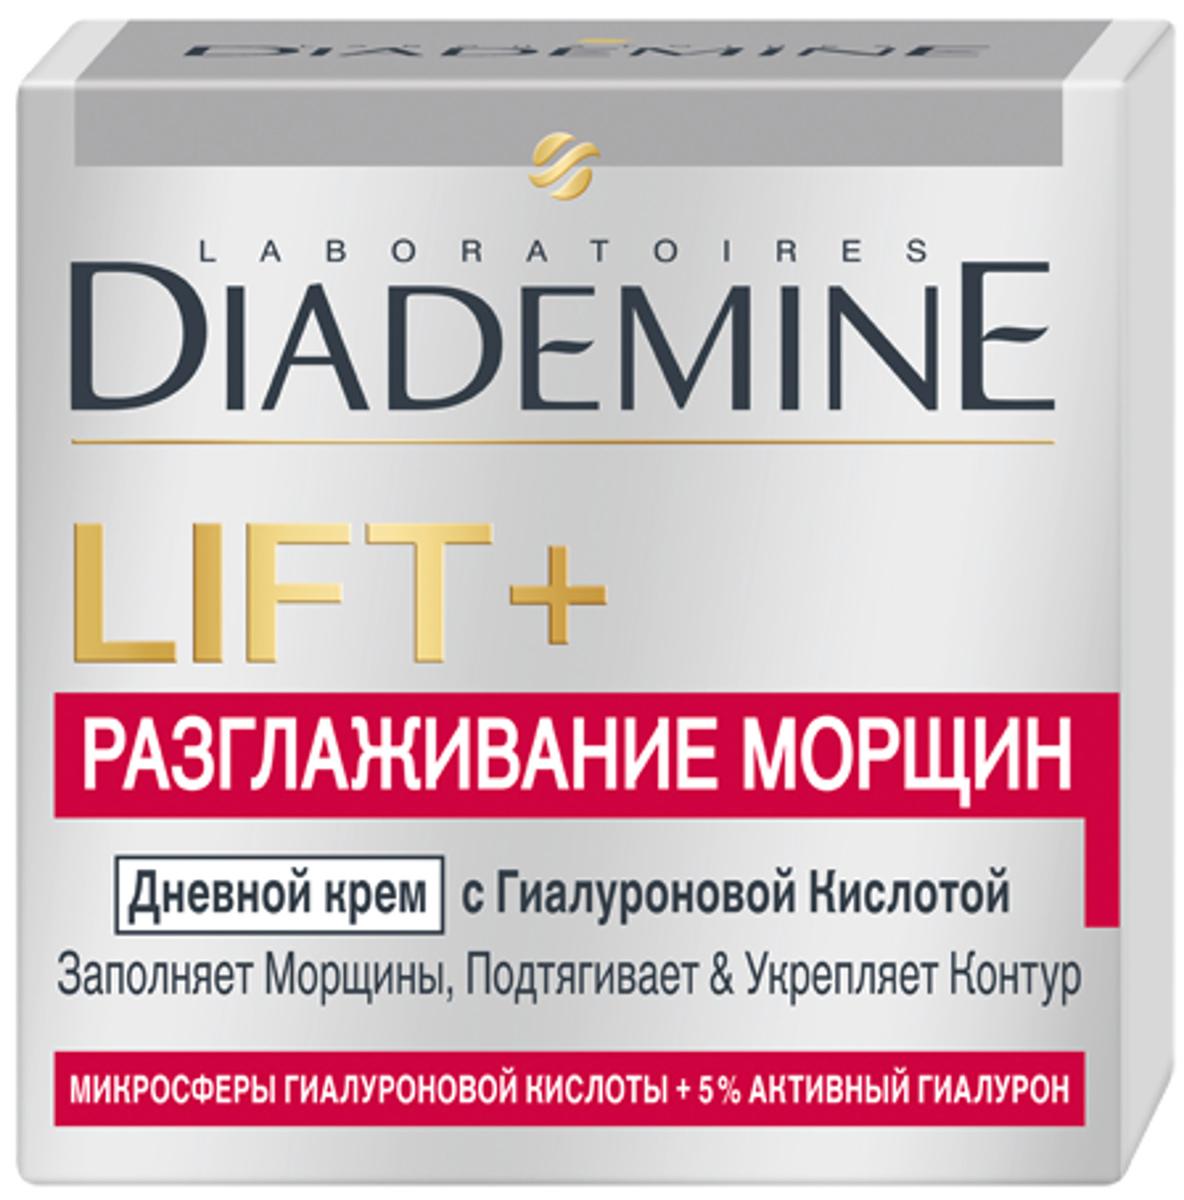 DIADEMINE LIFT+ SuperfillerРазглаживание морщин Дневной крем, 50мл Diademine